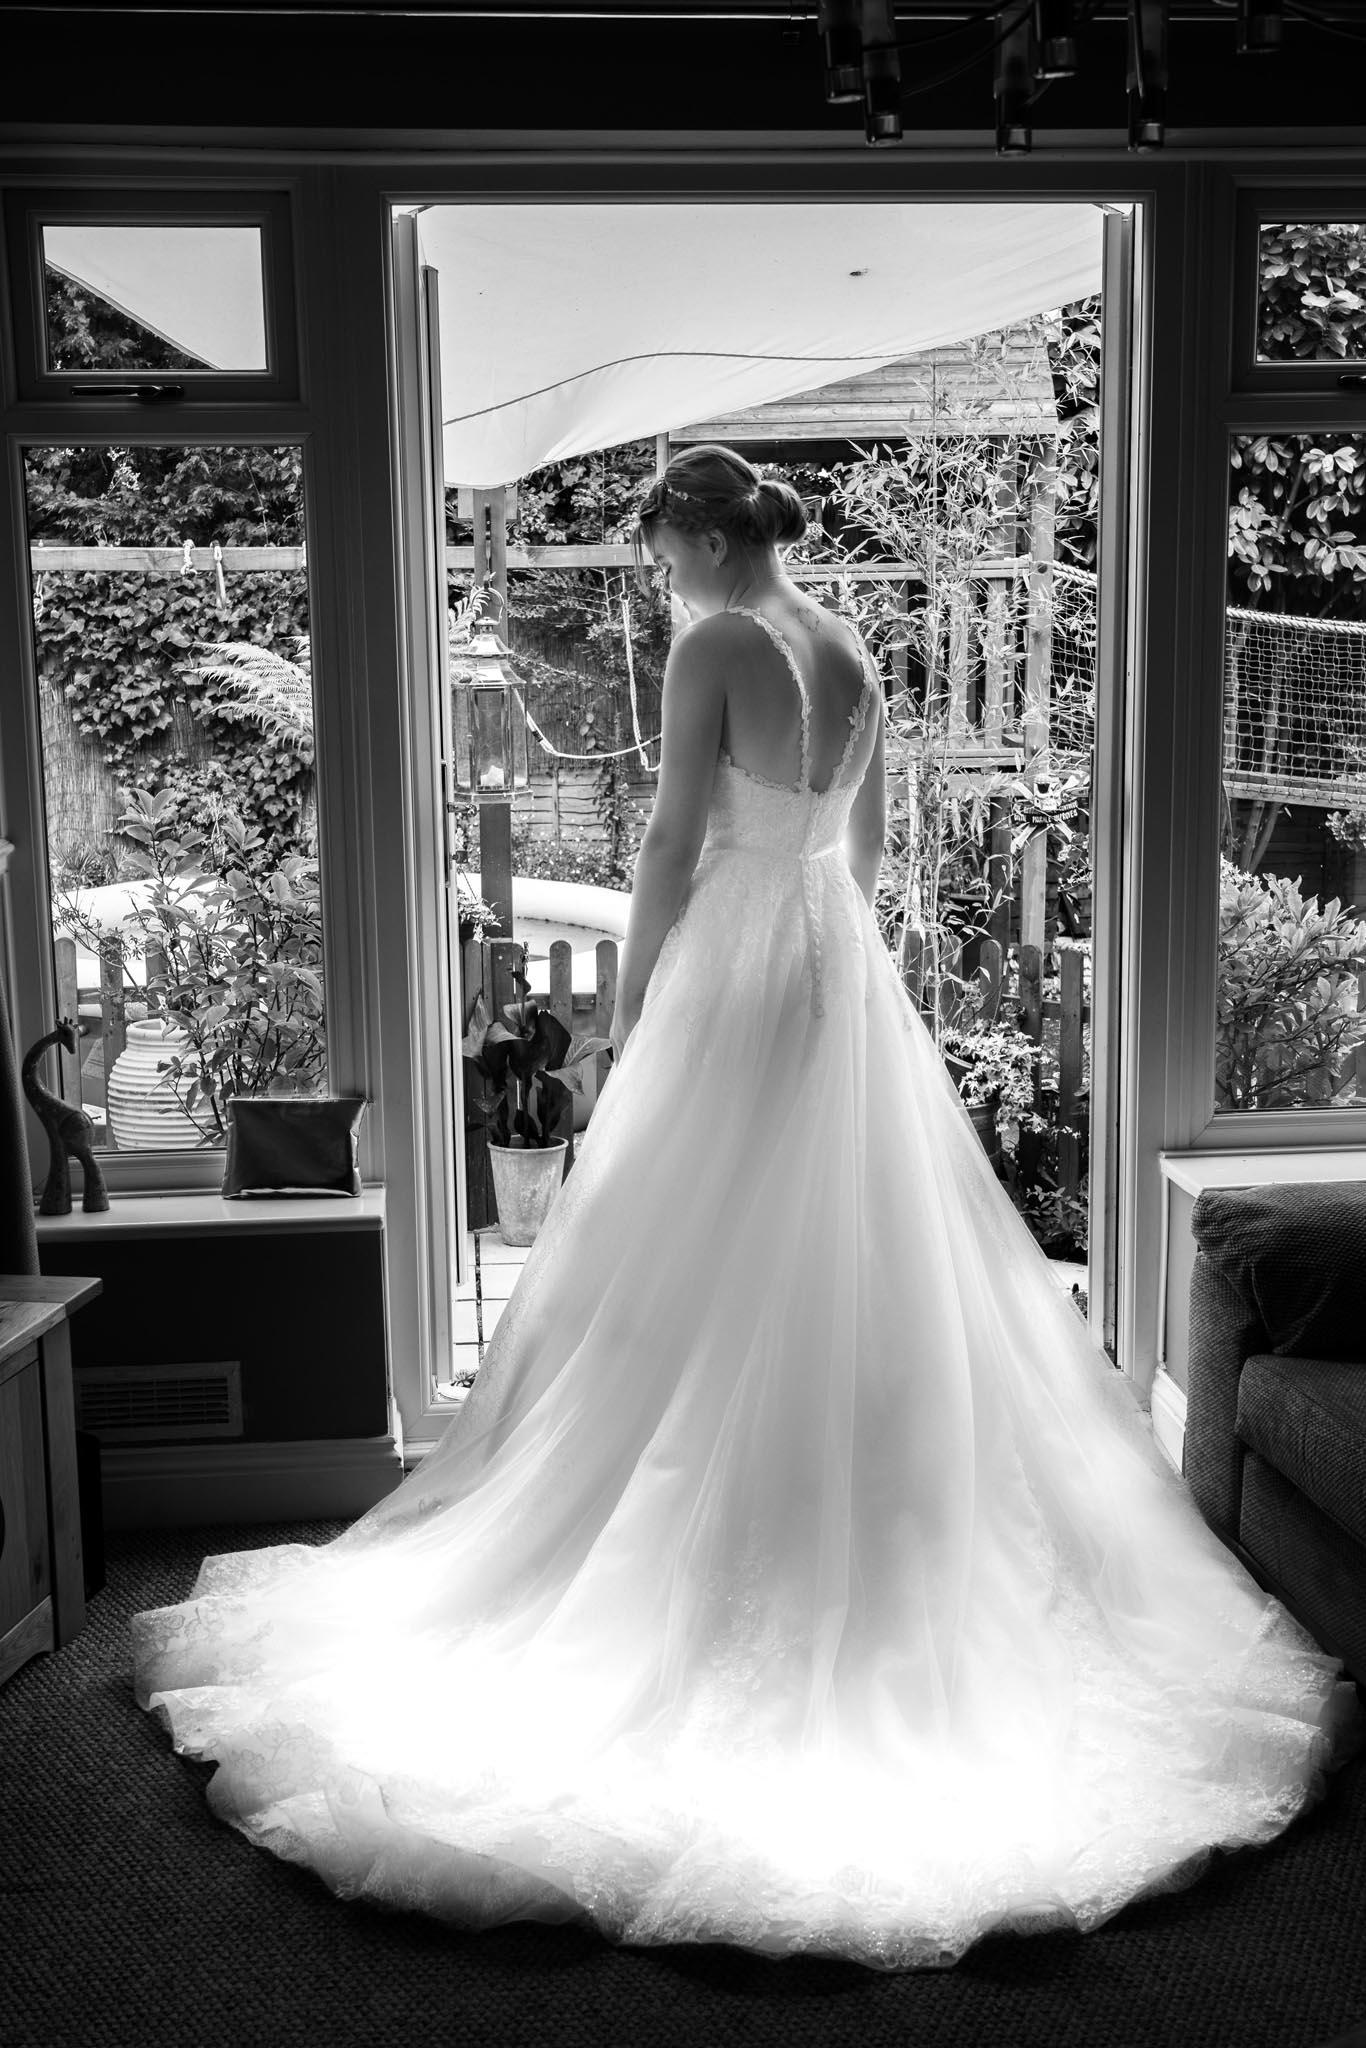 144-Preparations-Luke-Yasmin-The-Rayleigh-Club-Wedding-Photography.jpg